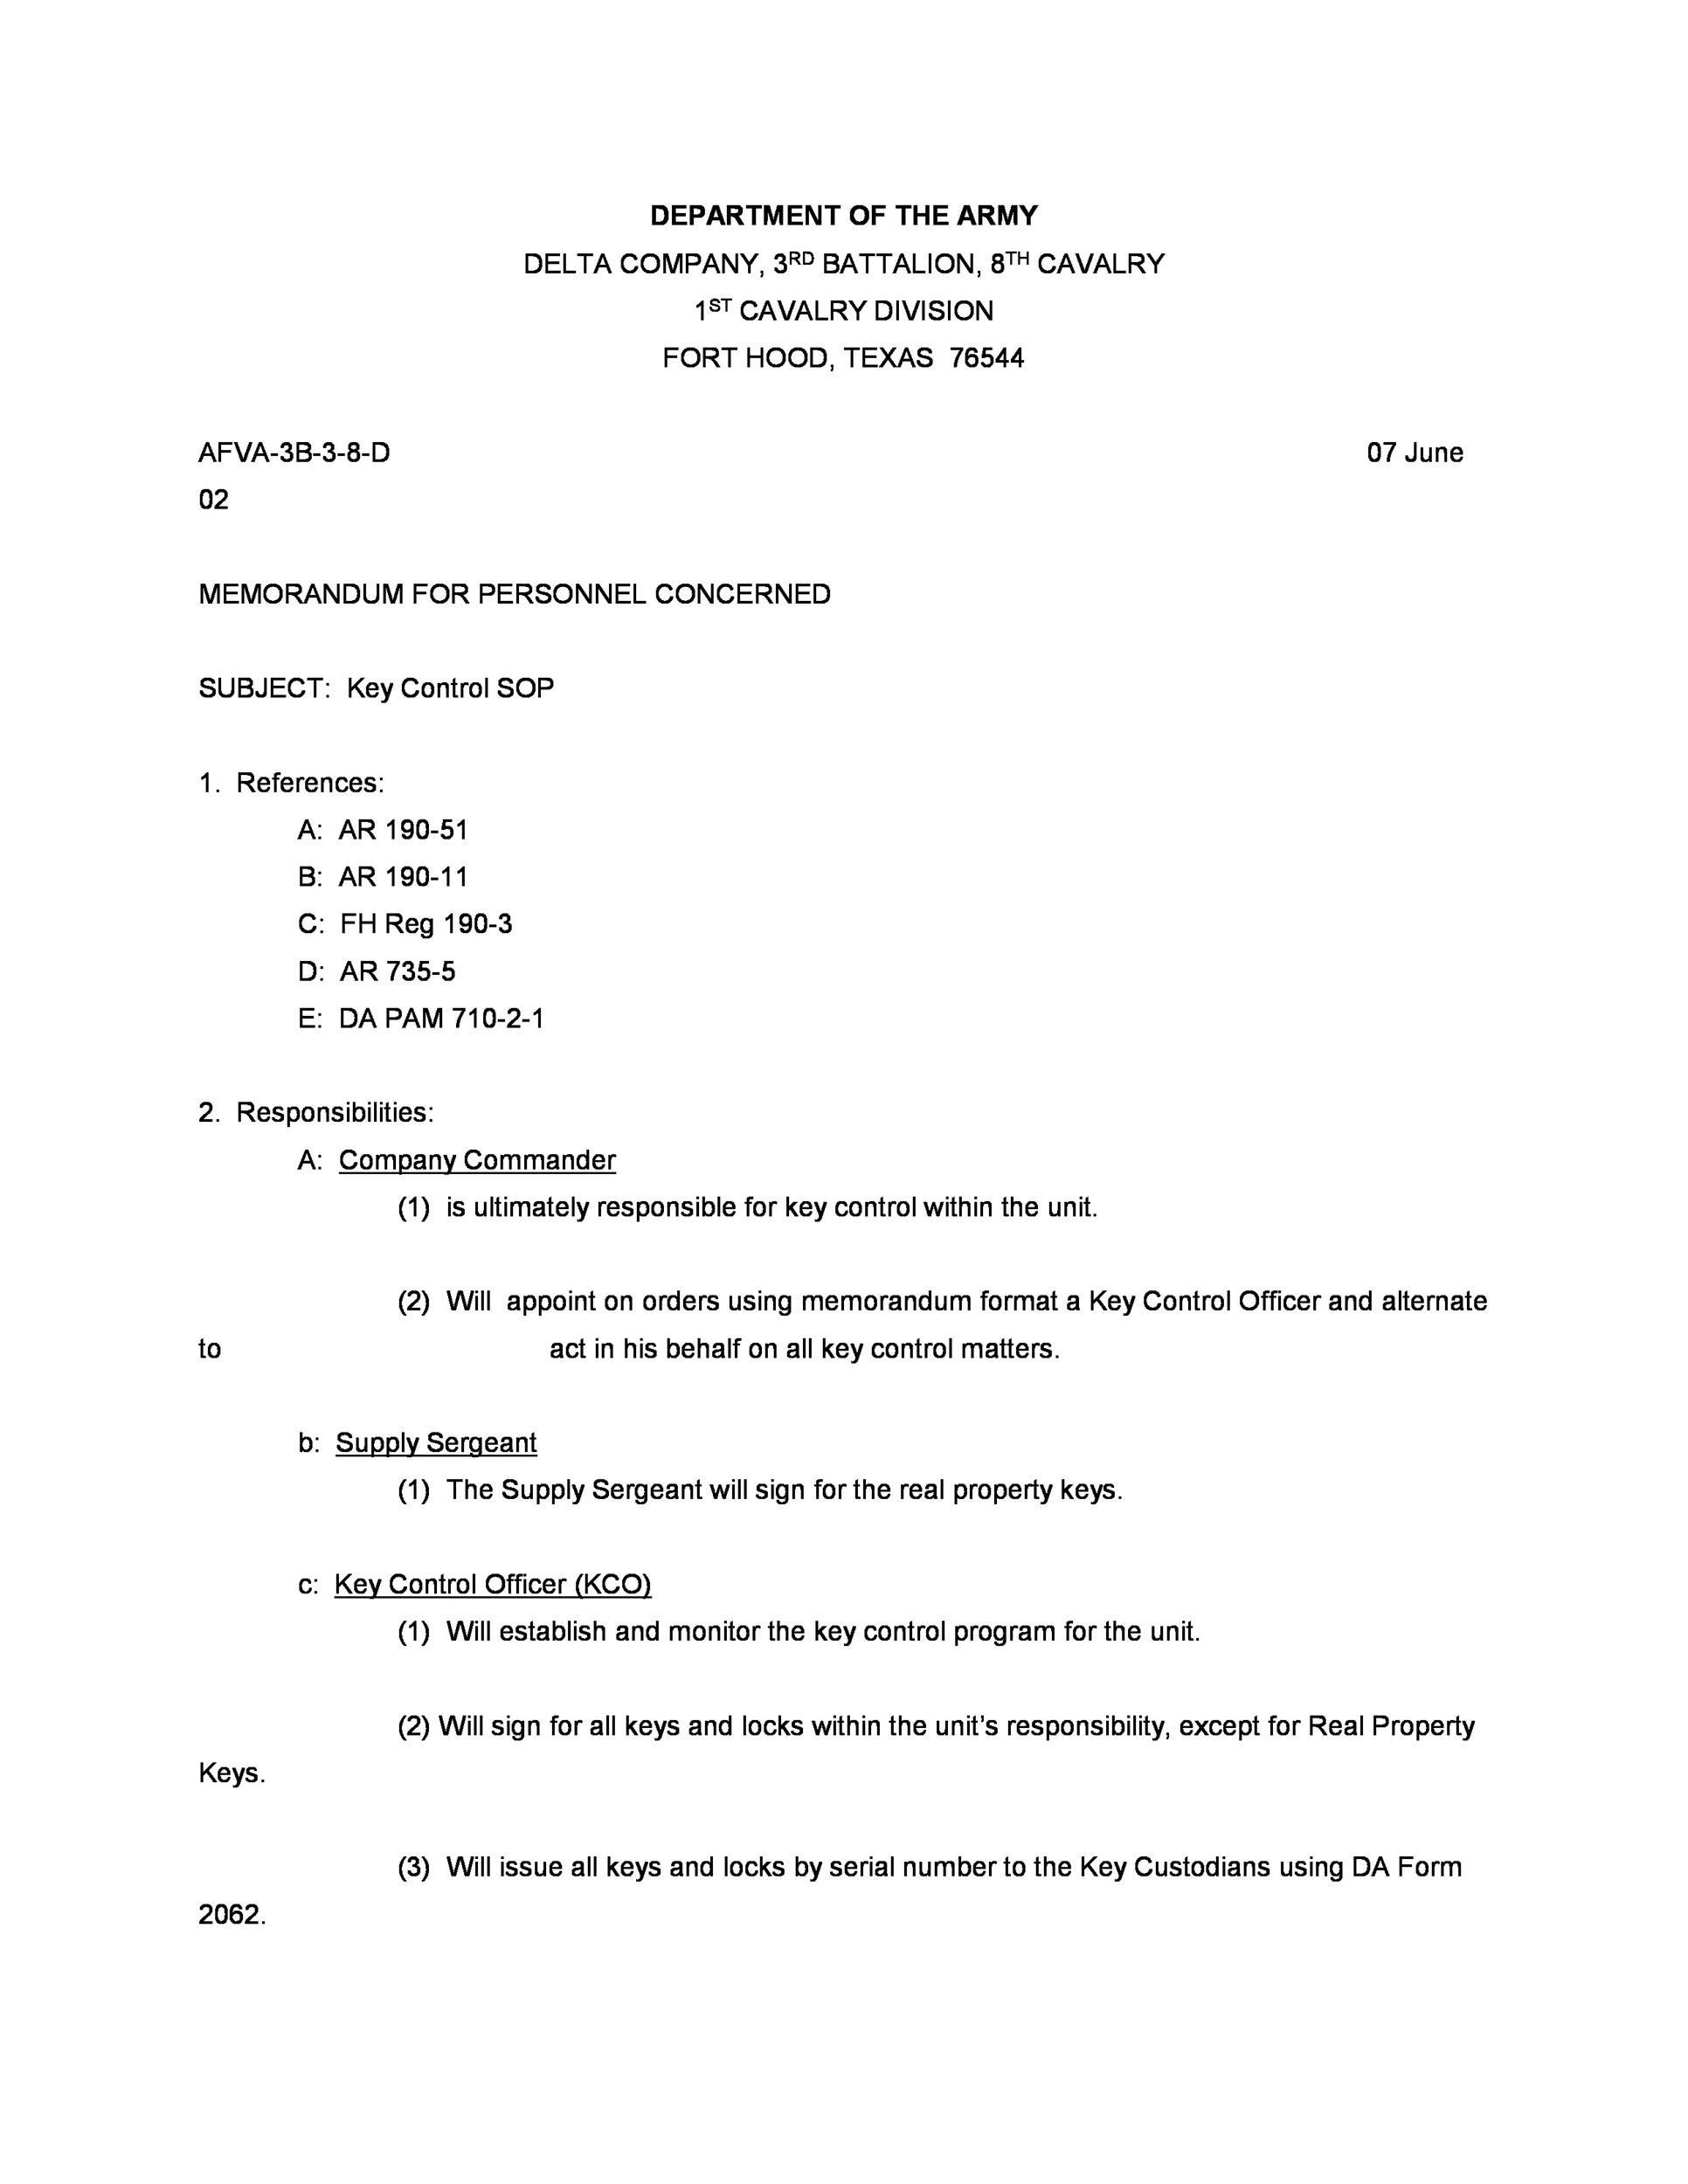 40 Private Placement Memorandum Templates Word PDF – Sample Private Placement Memorandum